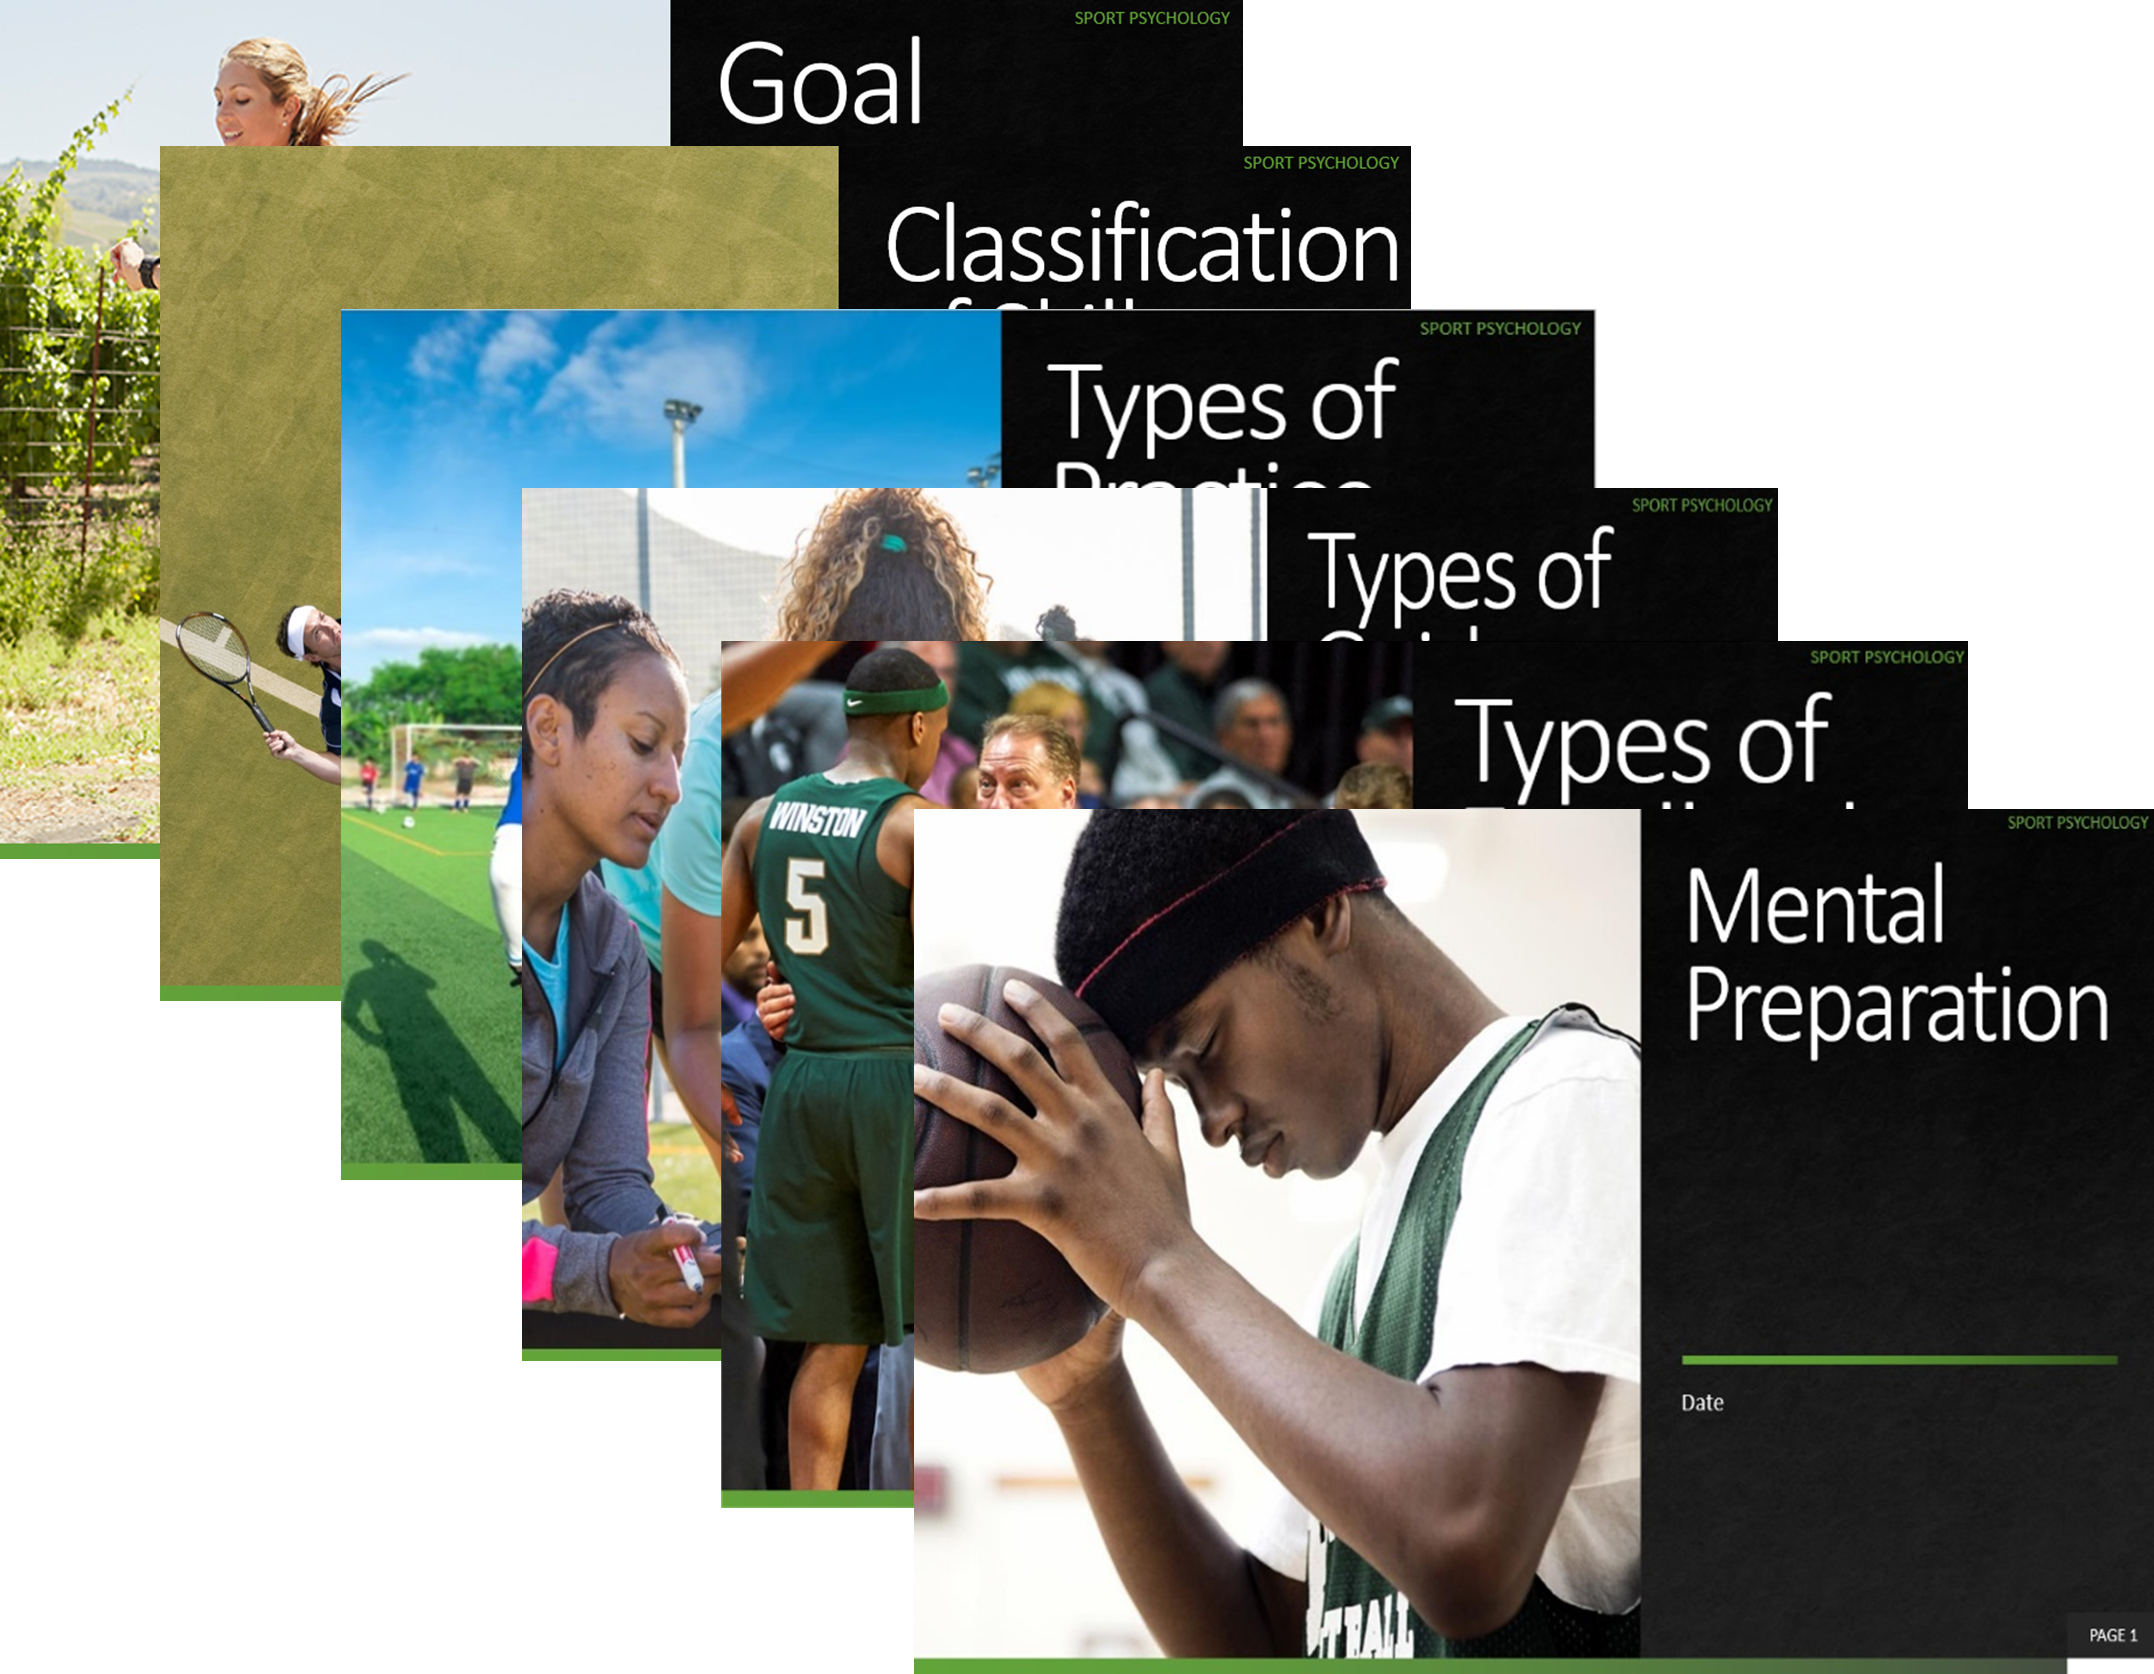 Sport Psychology SOW (Edexcel GCSE PE)